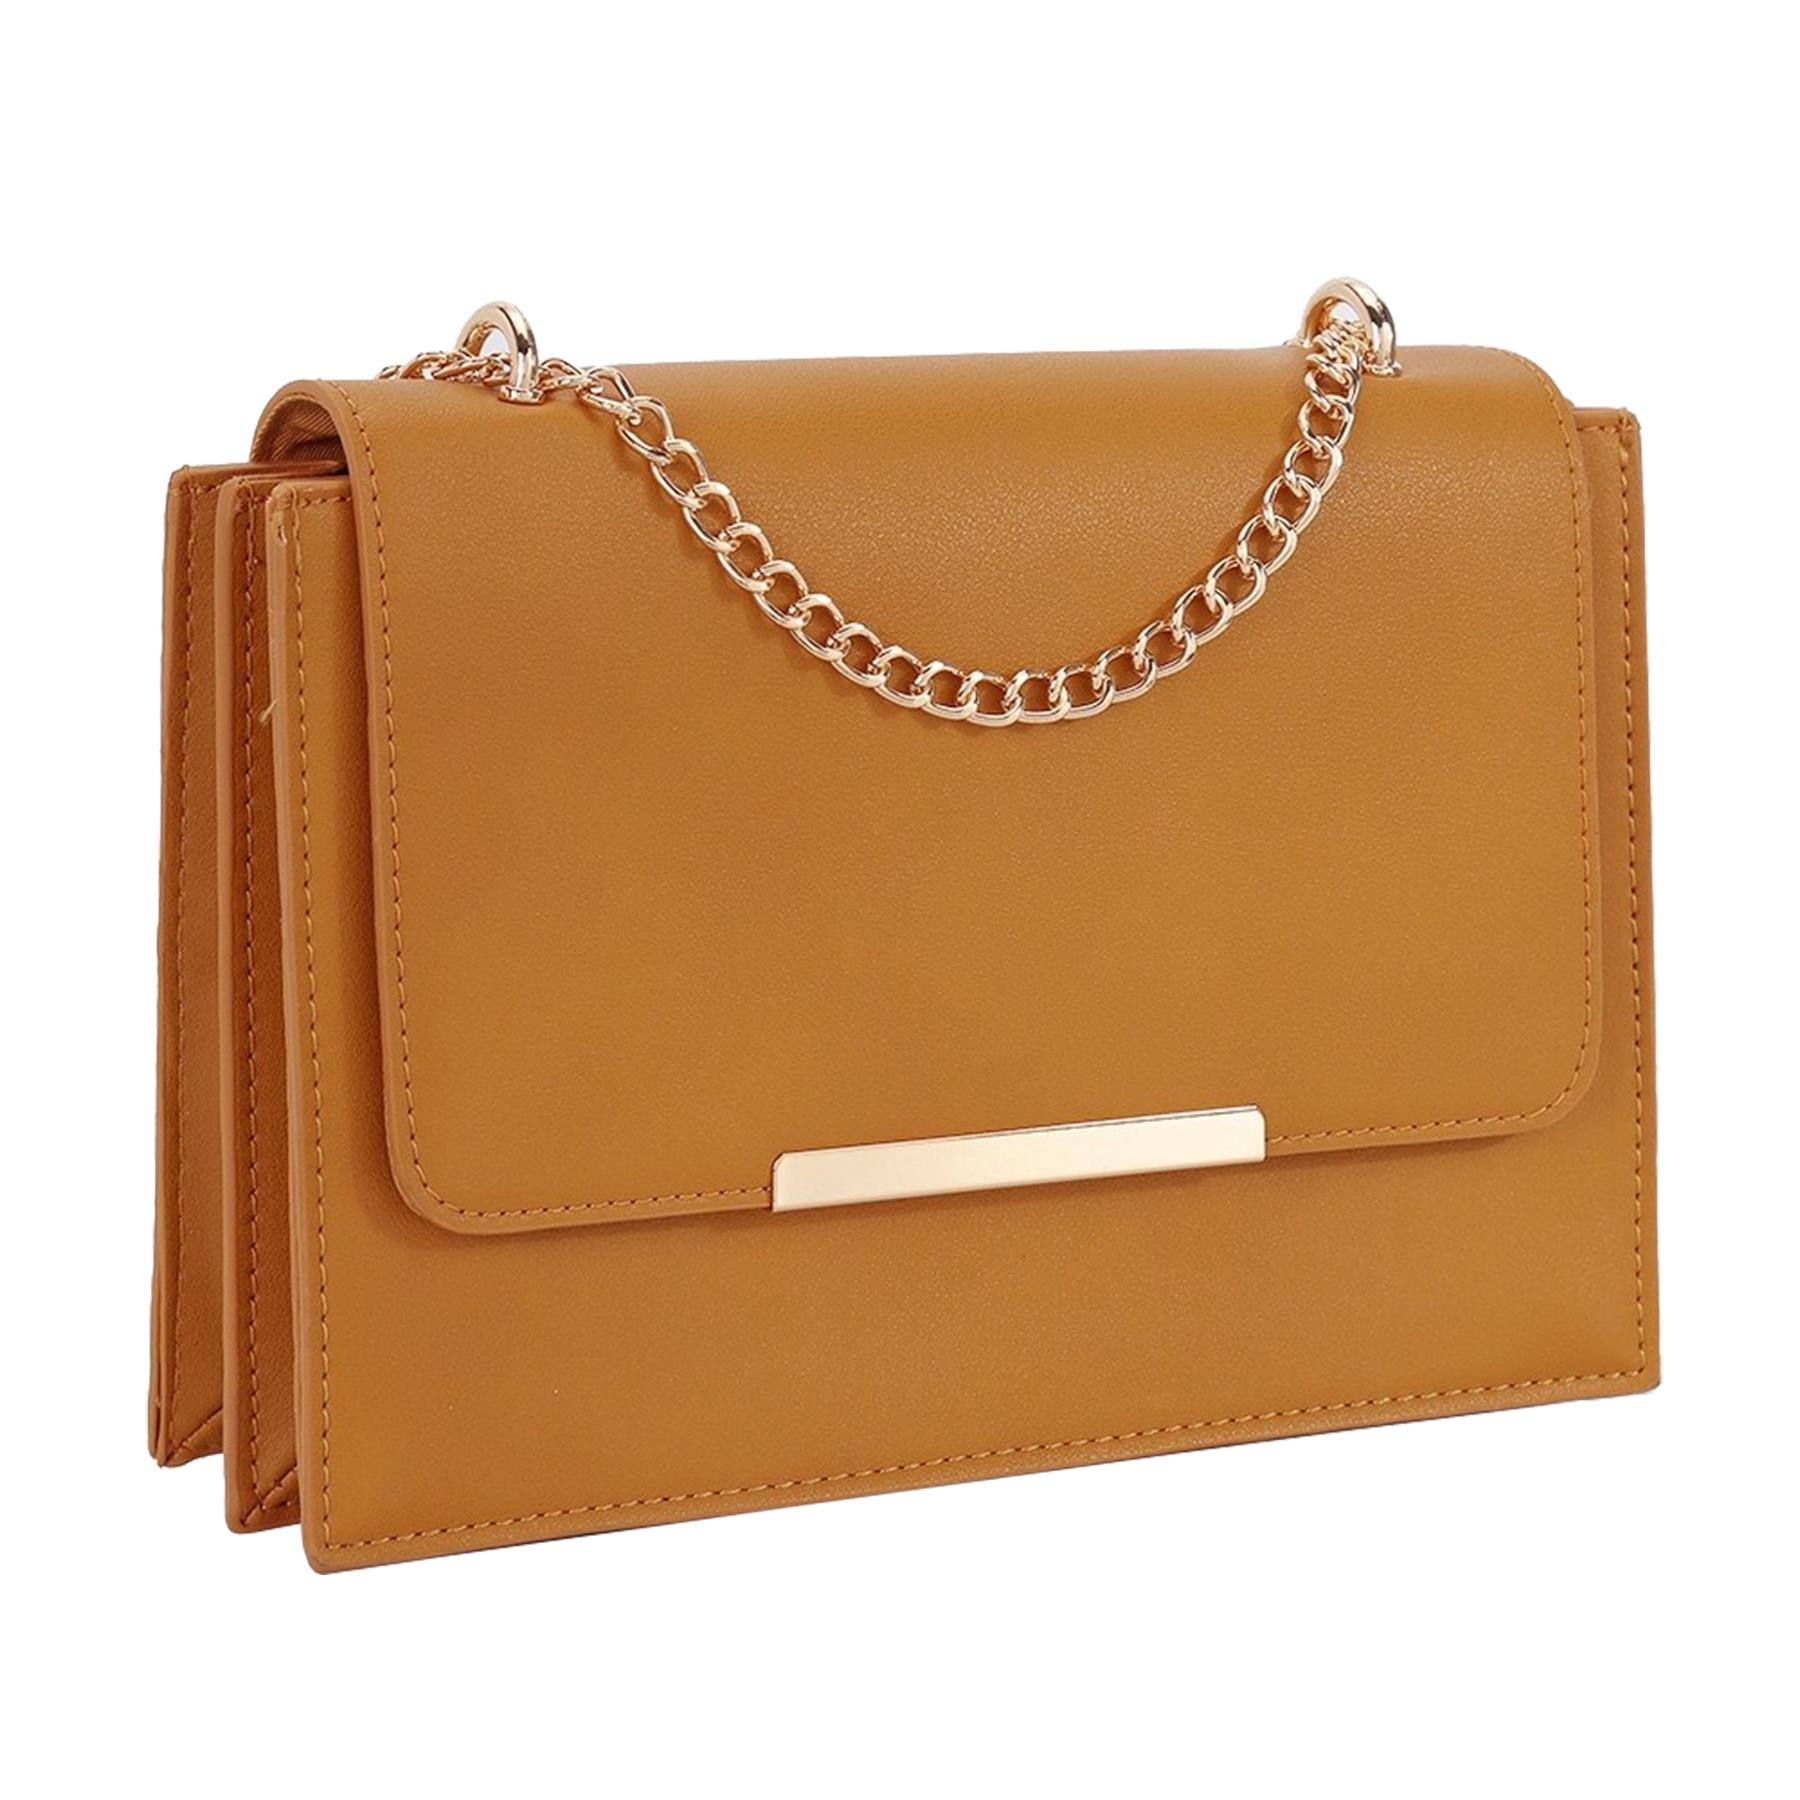 New-Women-s-Faux-Leather-Elegant-Stylish-Fashion-Shoulder-Clutch-Bag thumbnail 9